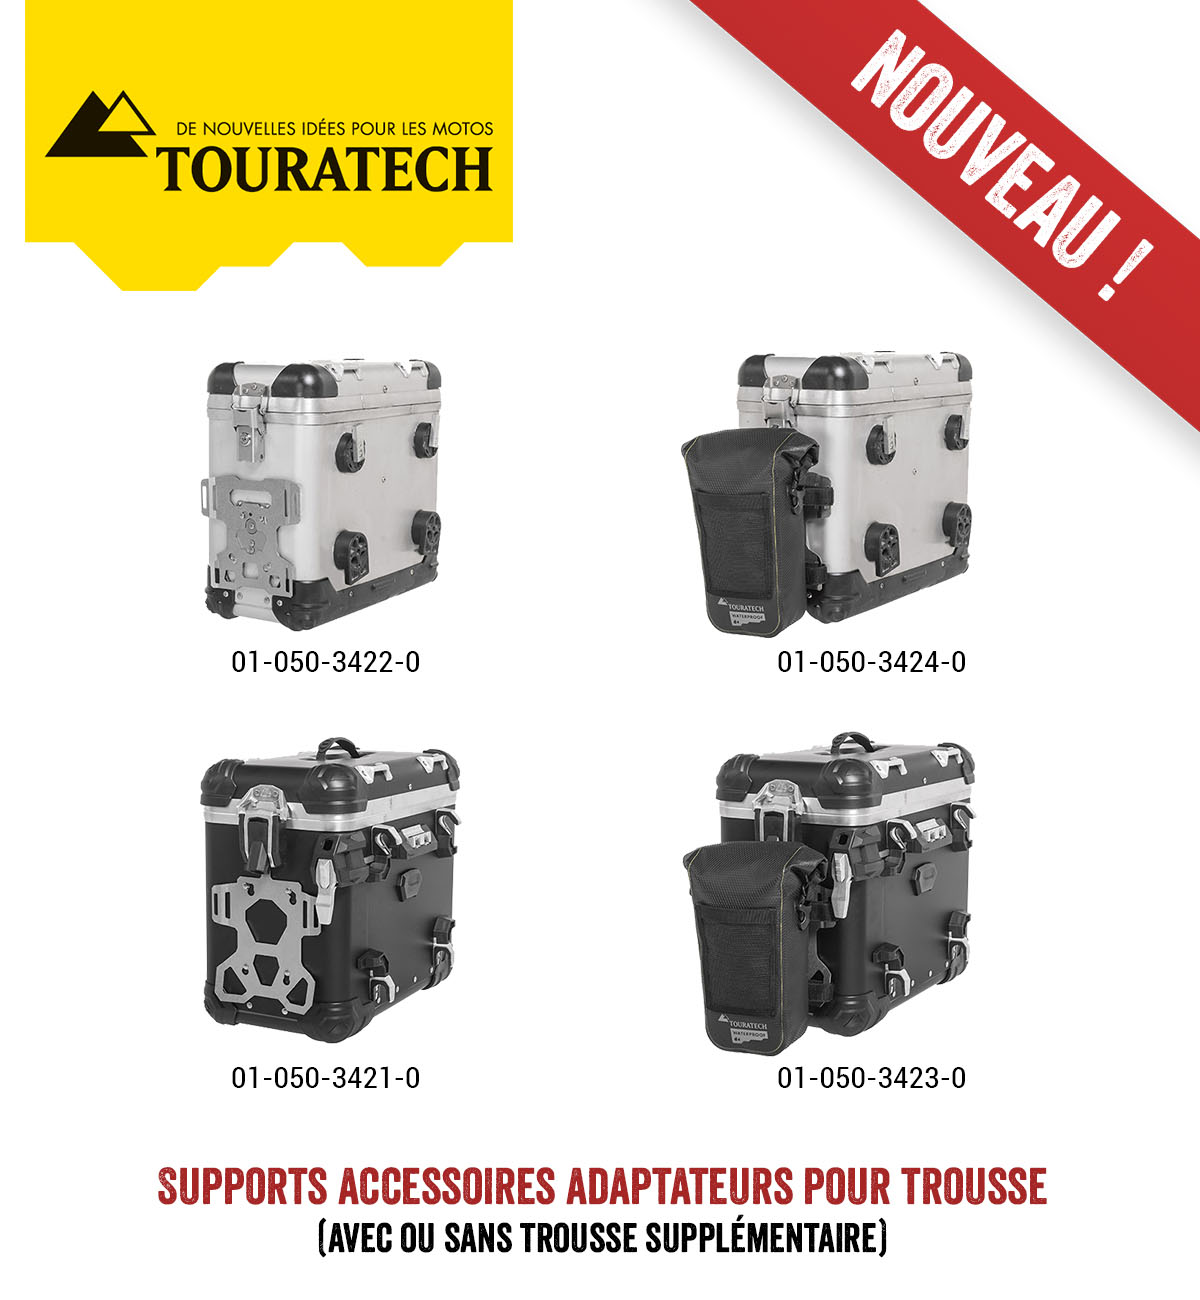 Touratech supports accessoires ZEGA